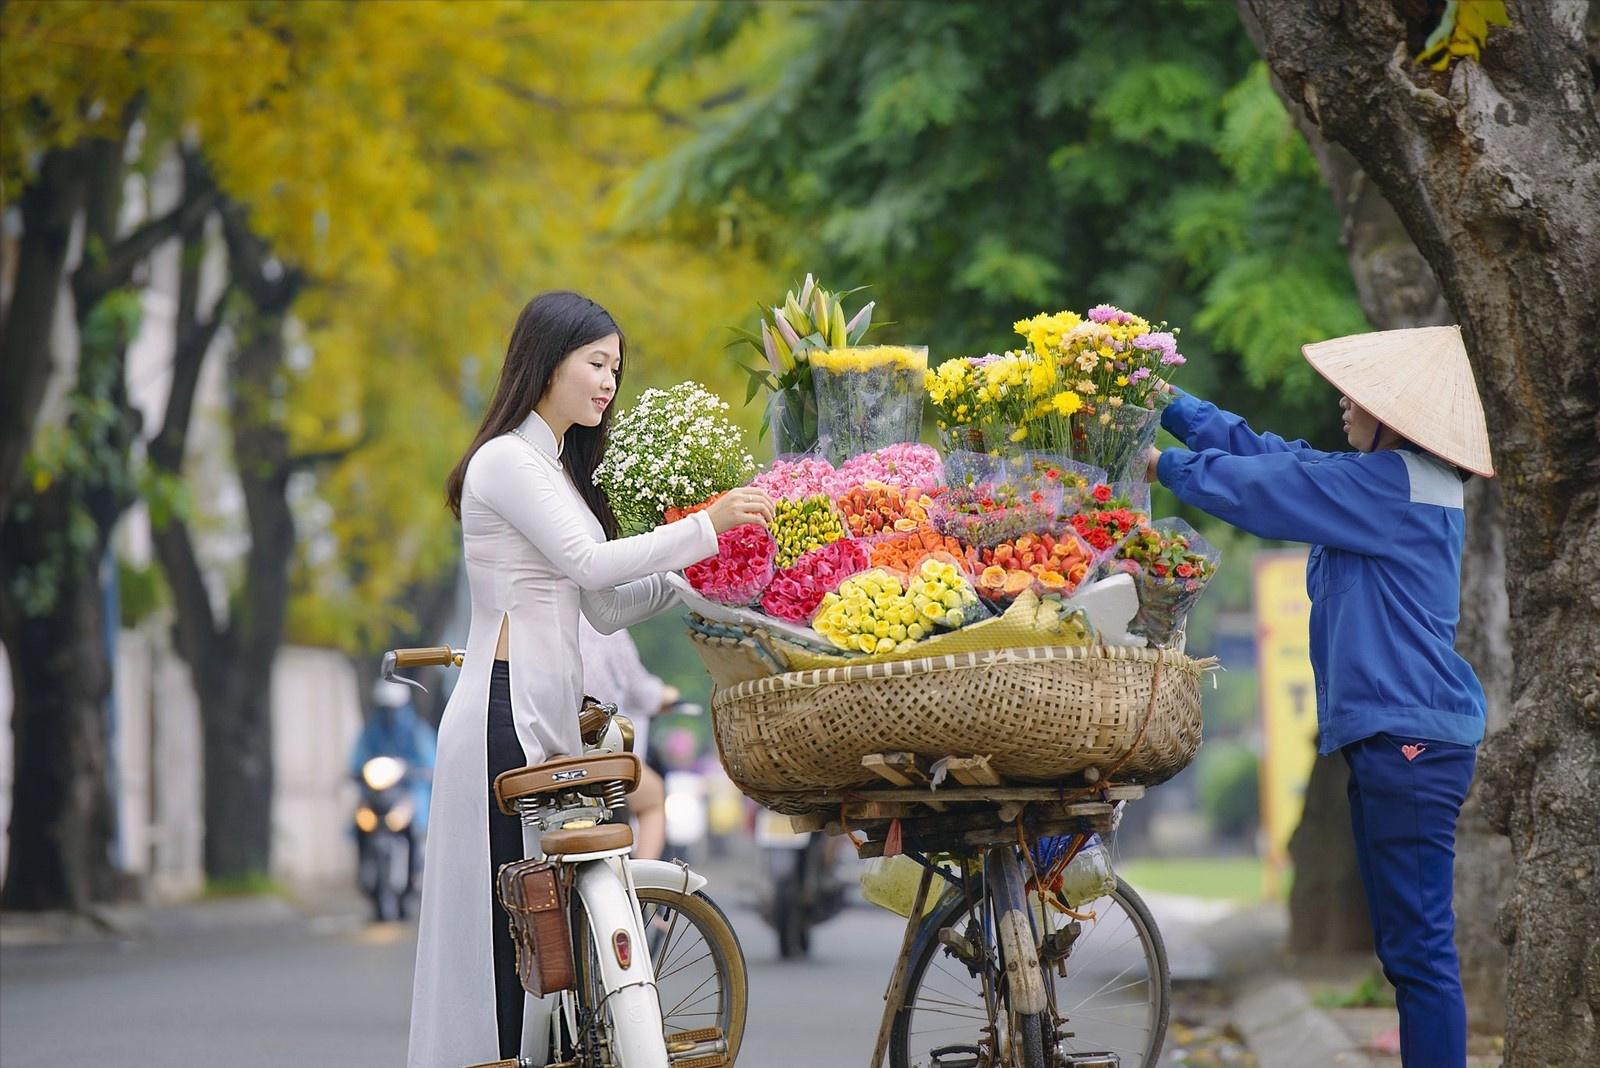 biet on nhung mua hoa